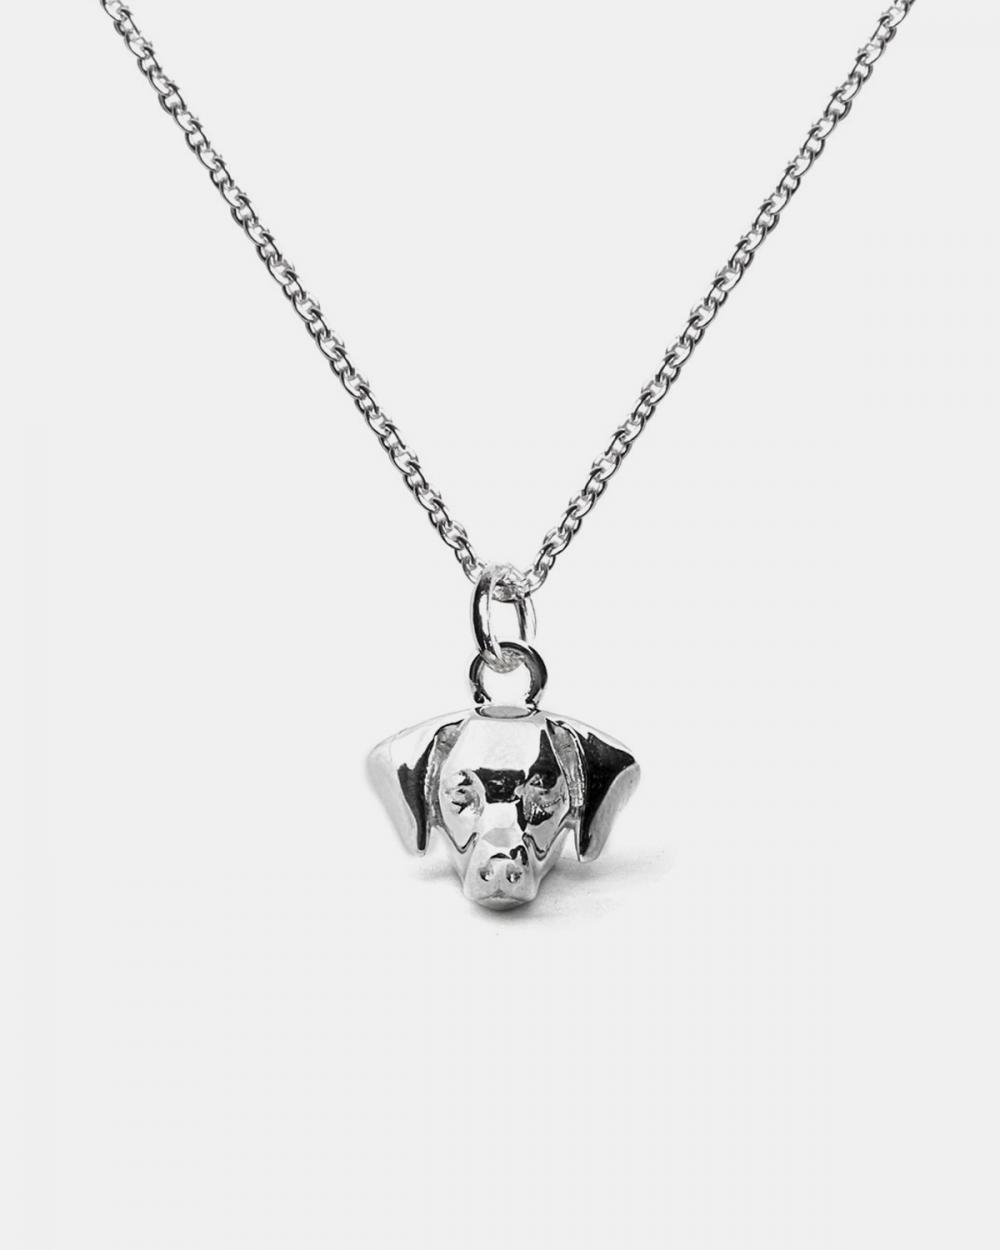 Necklaces WEIMARANER PENDANT NECKLACE F040 L60 / POLISHED SILVER NOVE25